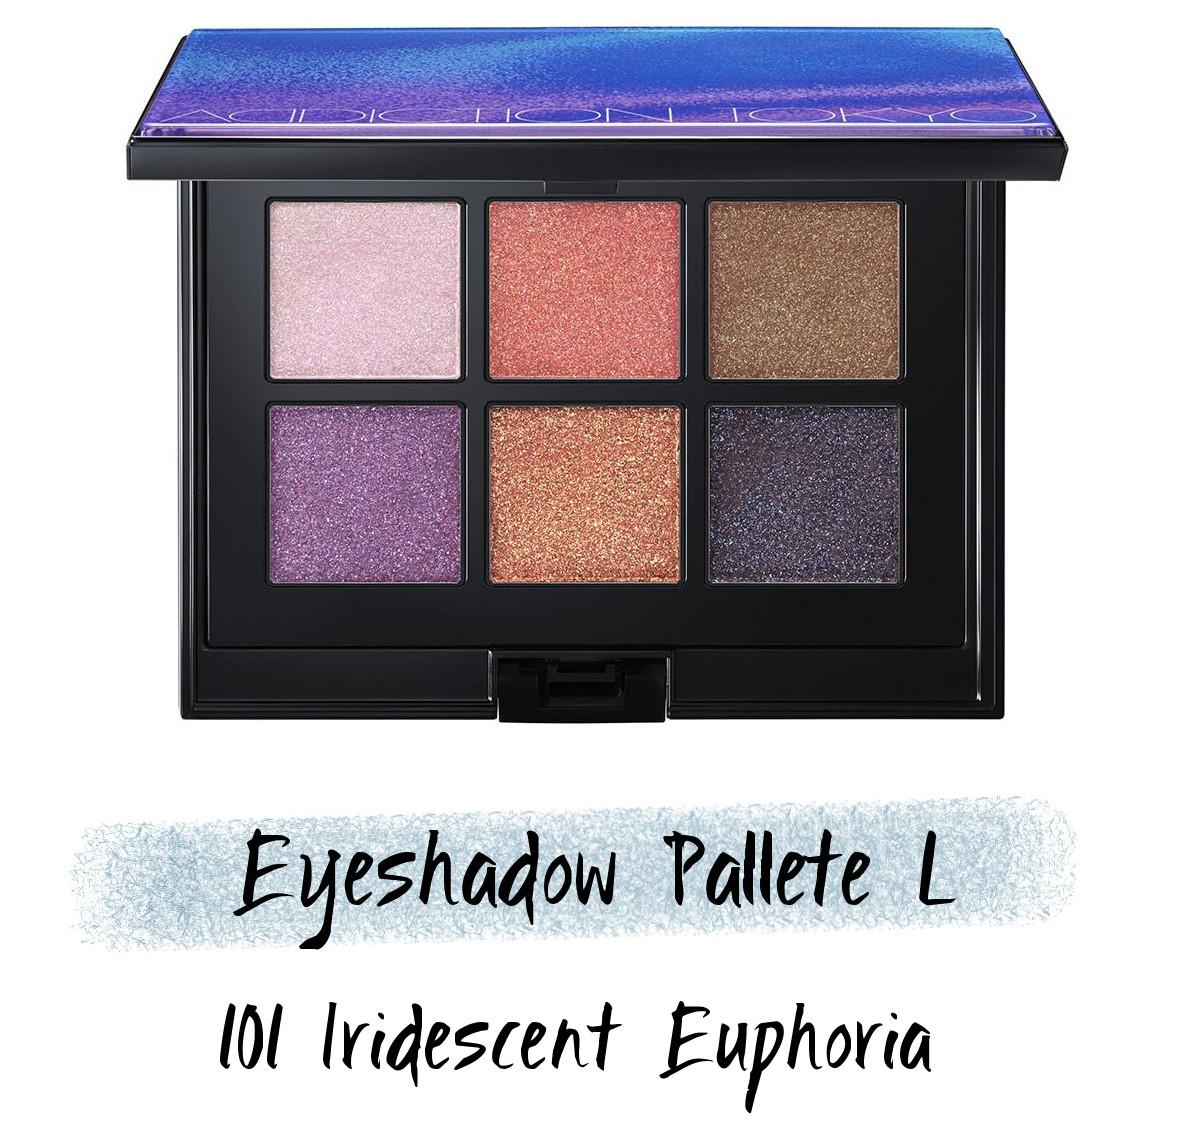 ADDICTION Holiday 2020 Collection IRIDESCENT EUPHORIA Holiday Addiction Iridescent Euphoria Eyeshadow Pallete L 101 Iridescent Euphoria